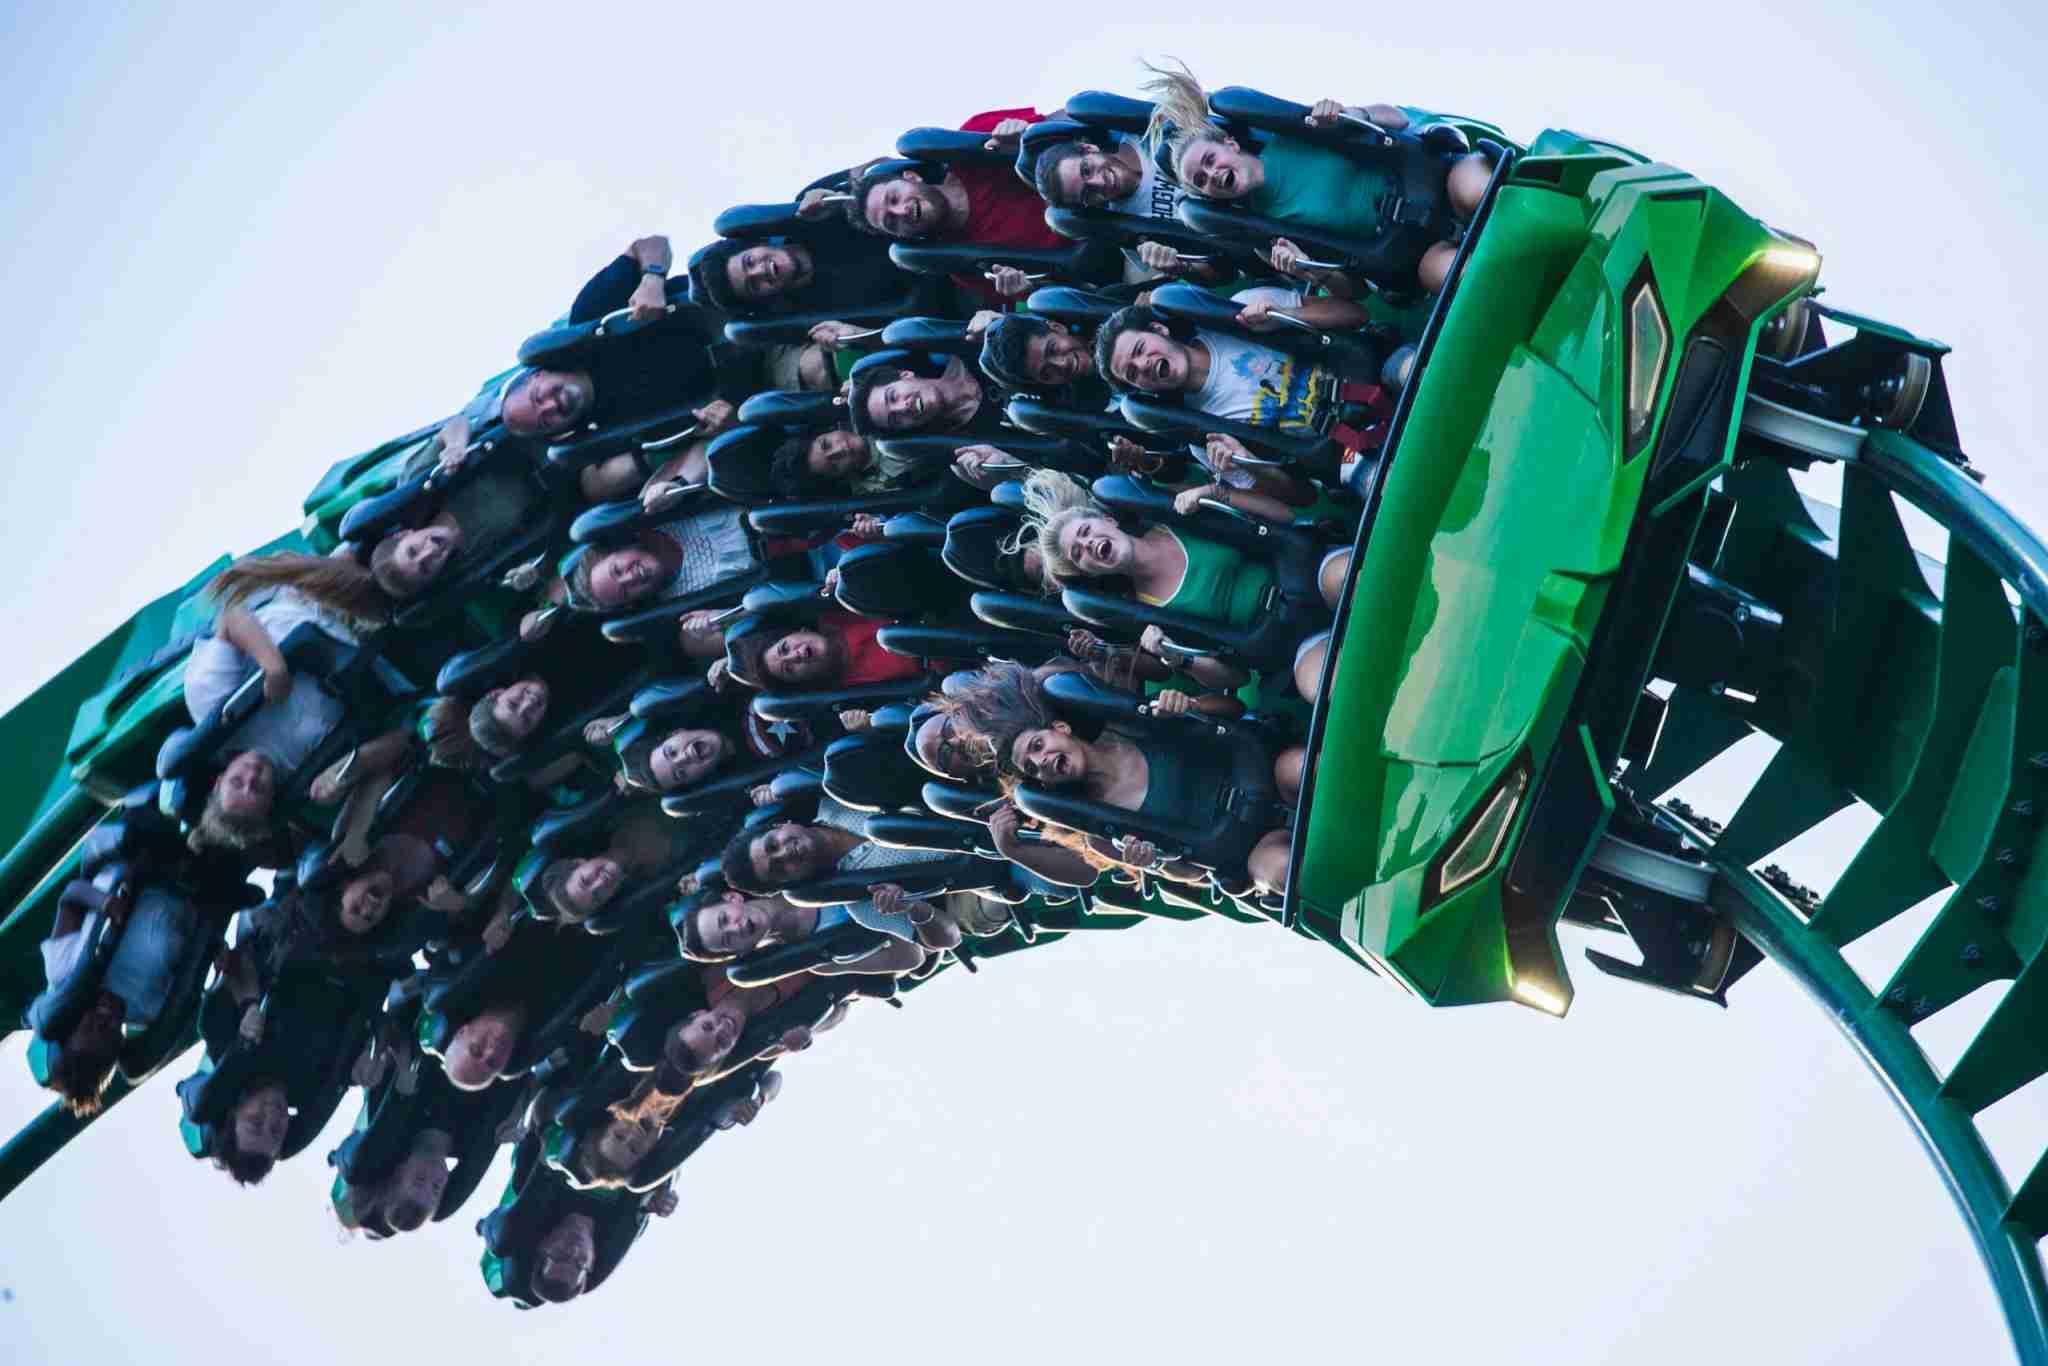 The Incredible Hulk Coaster (Photo courtesy of Universal Orlando.)